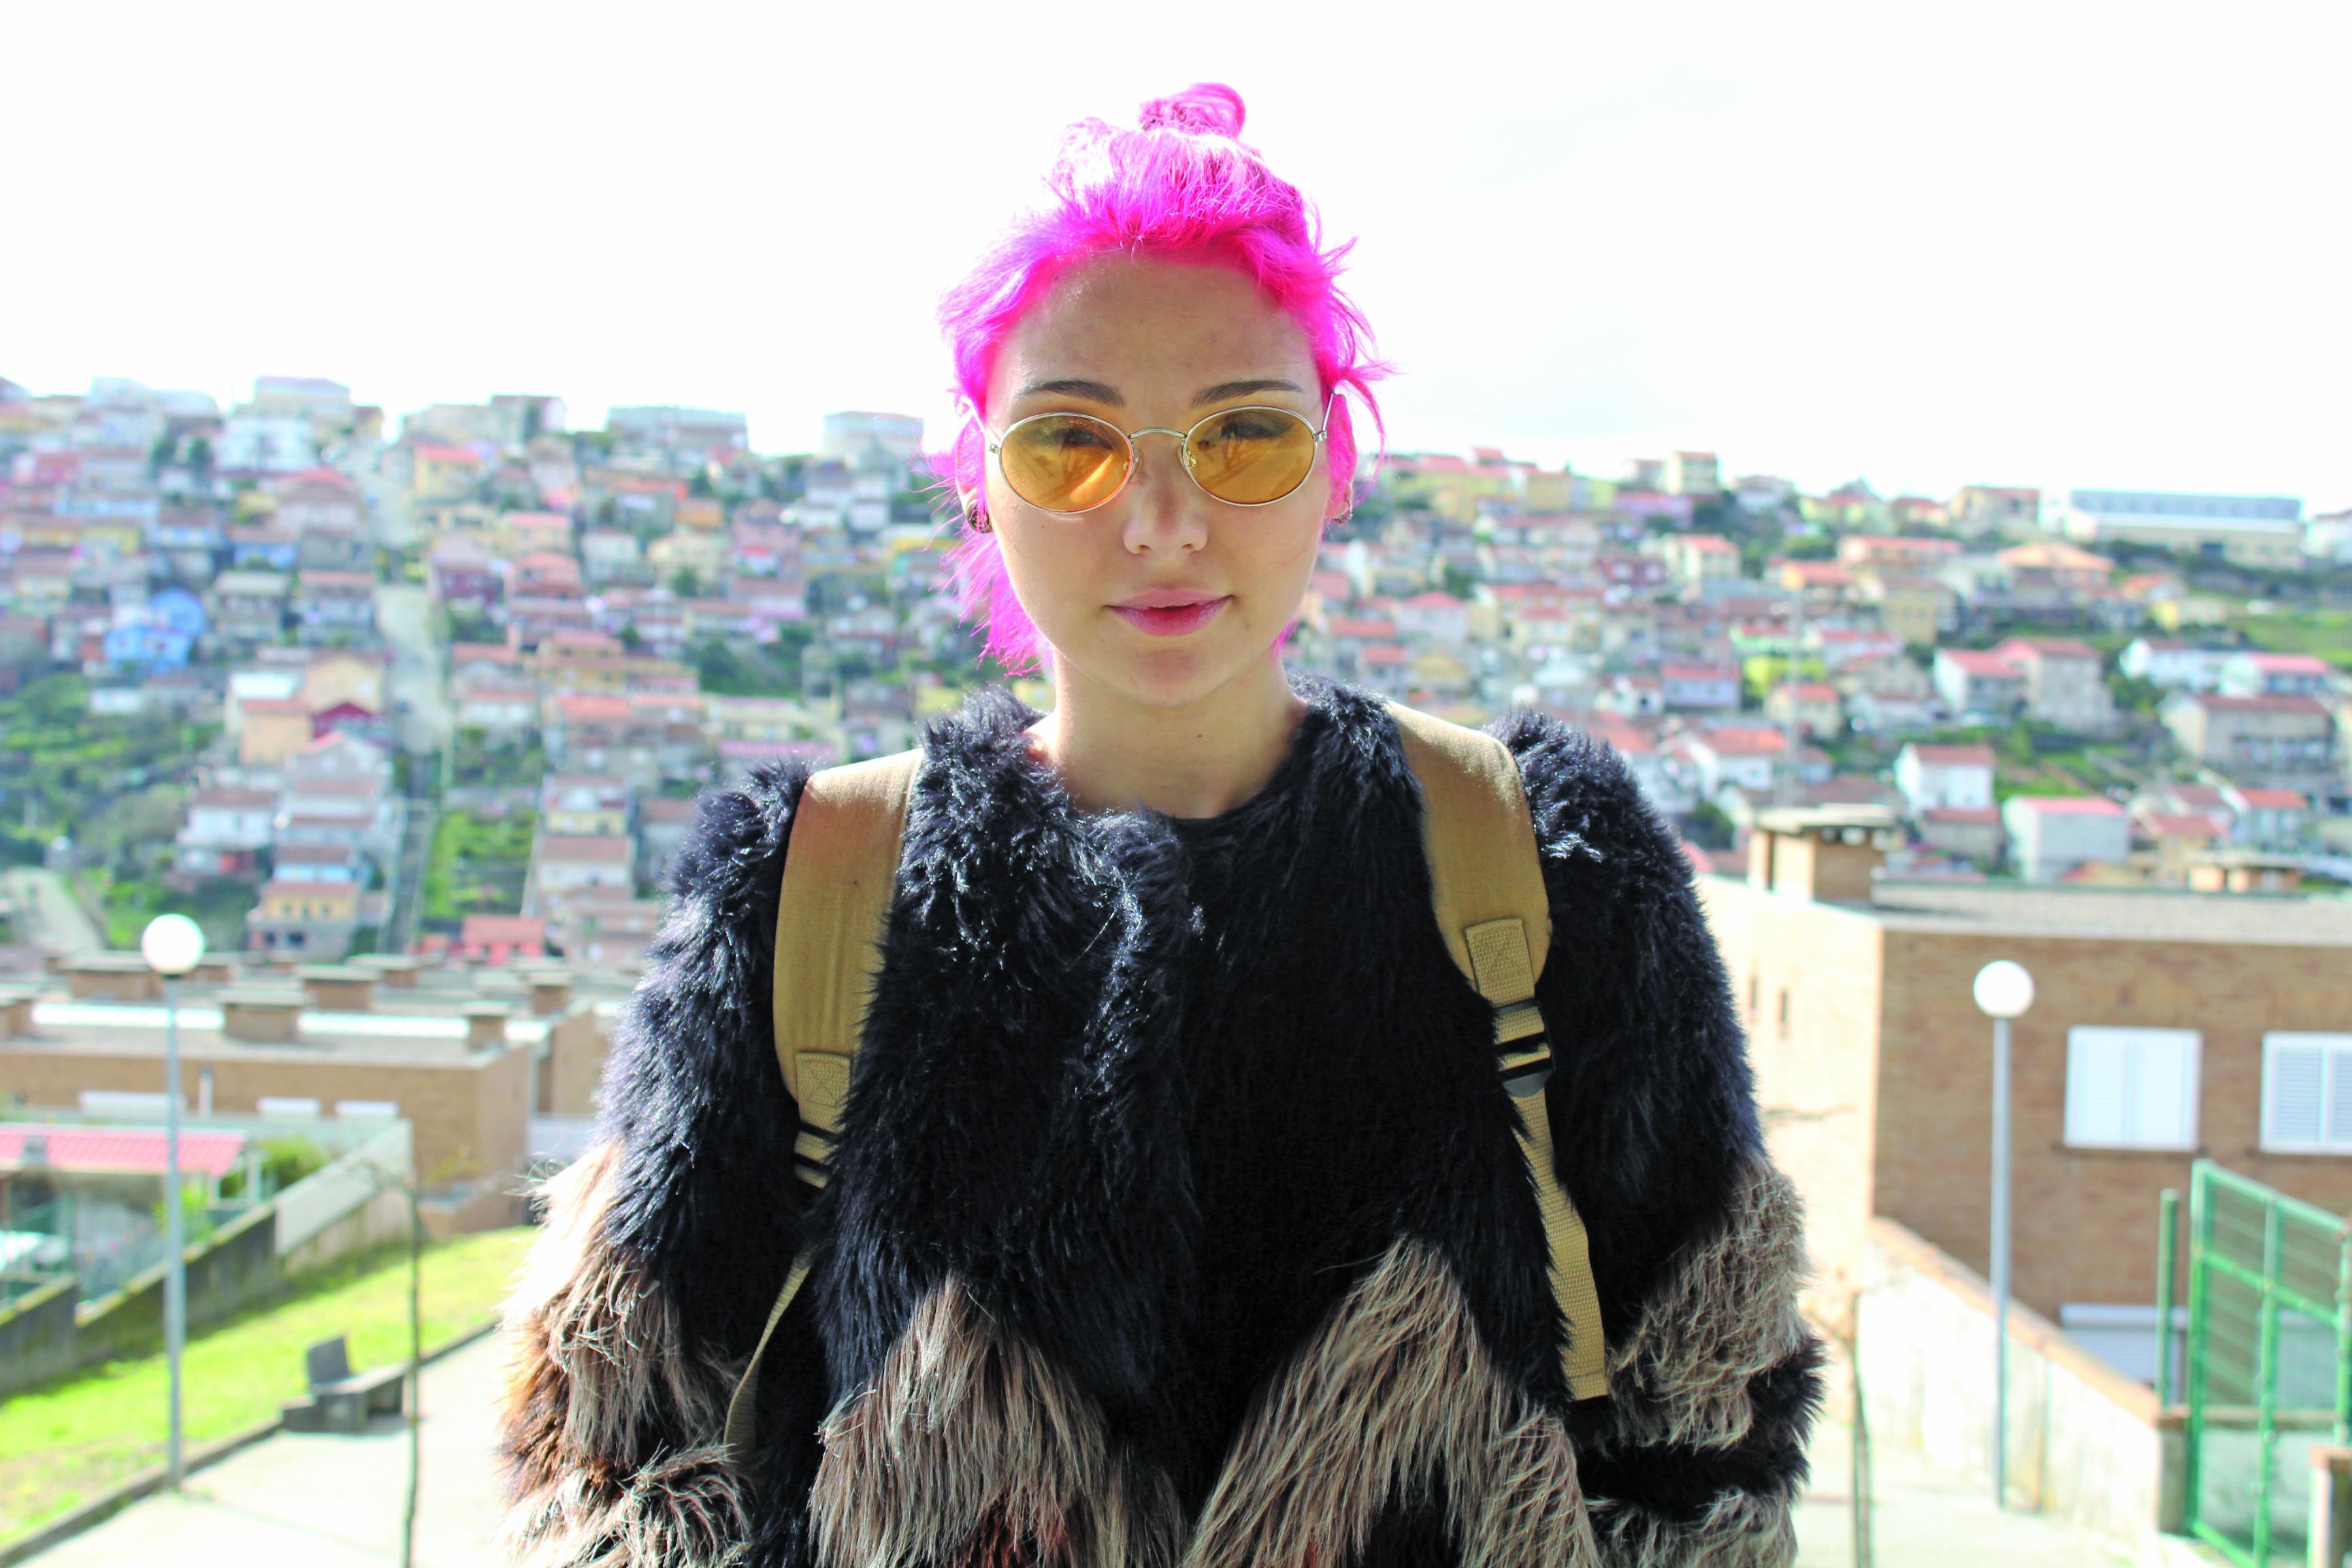 Cláudia Pascoal - março 2018